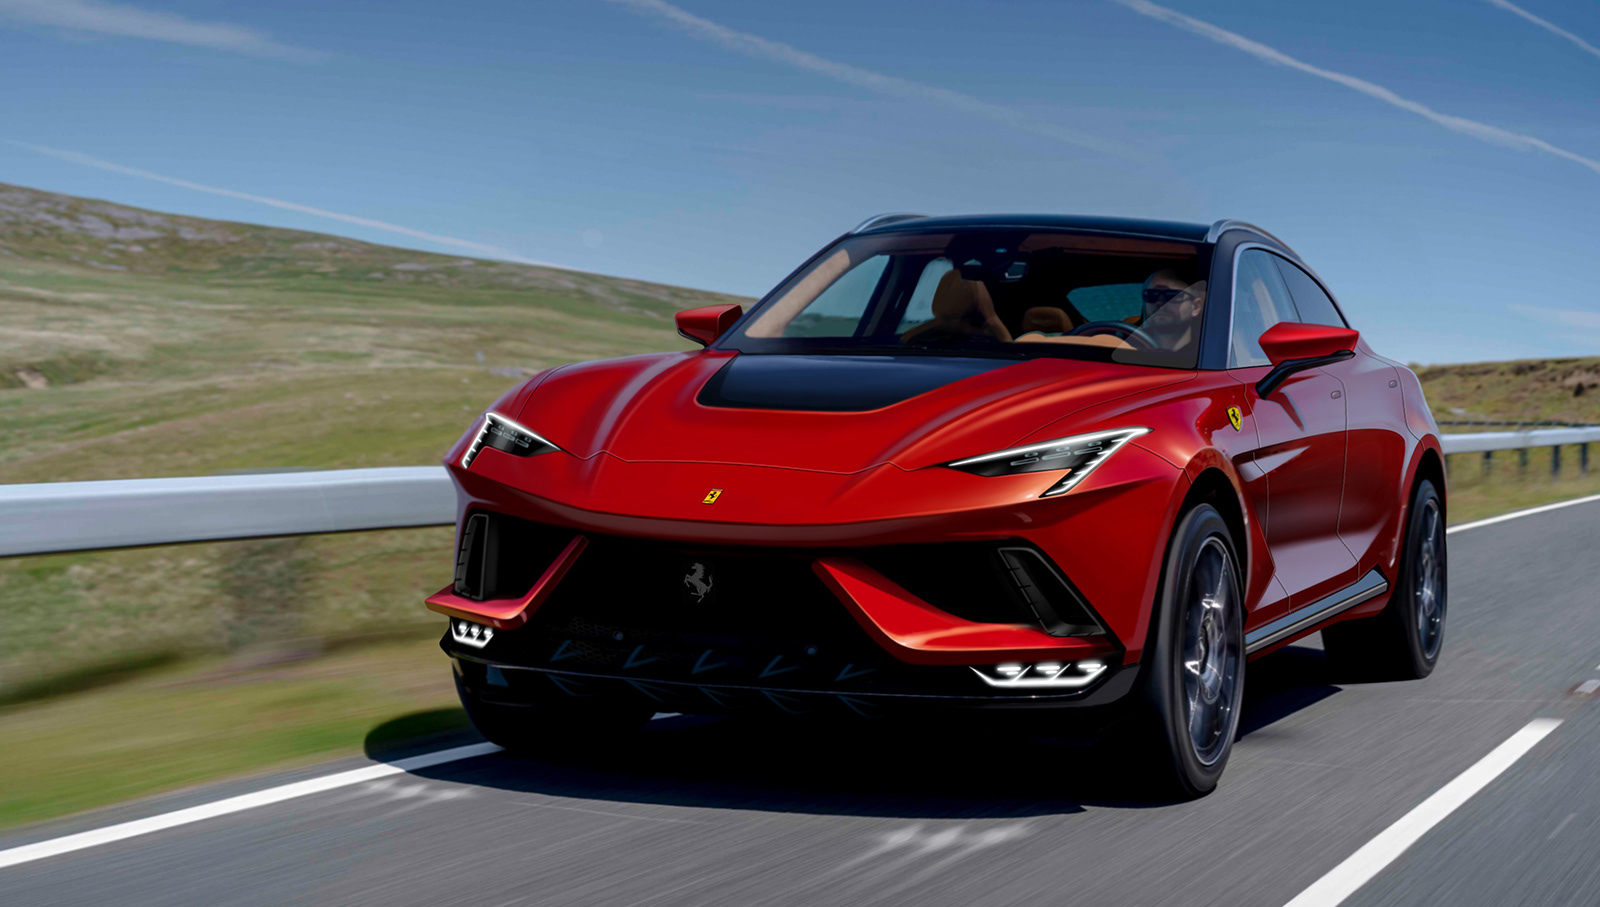 Ferrari Purosangue Rendering Shows Prancing Horse Suv In Lambo Fighting Mode Autoevolution